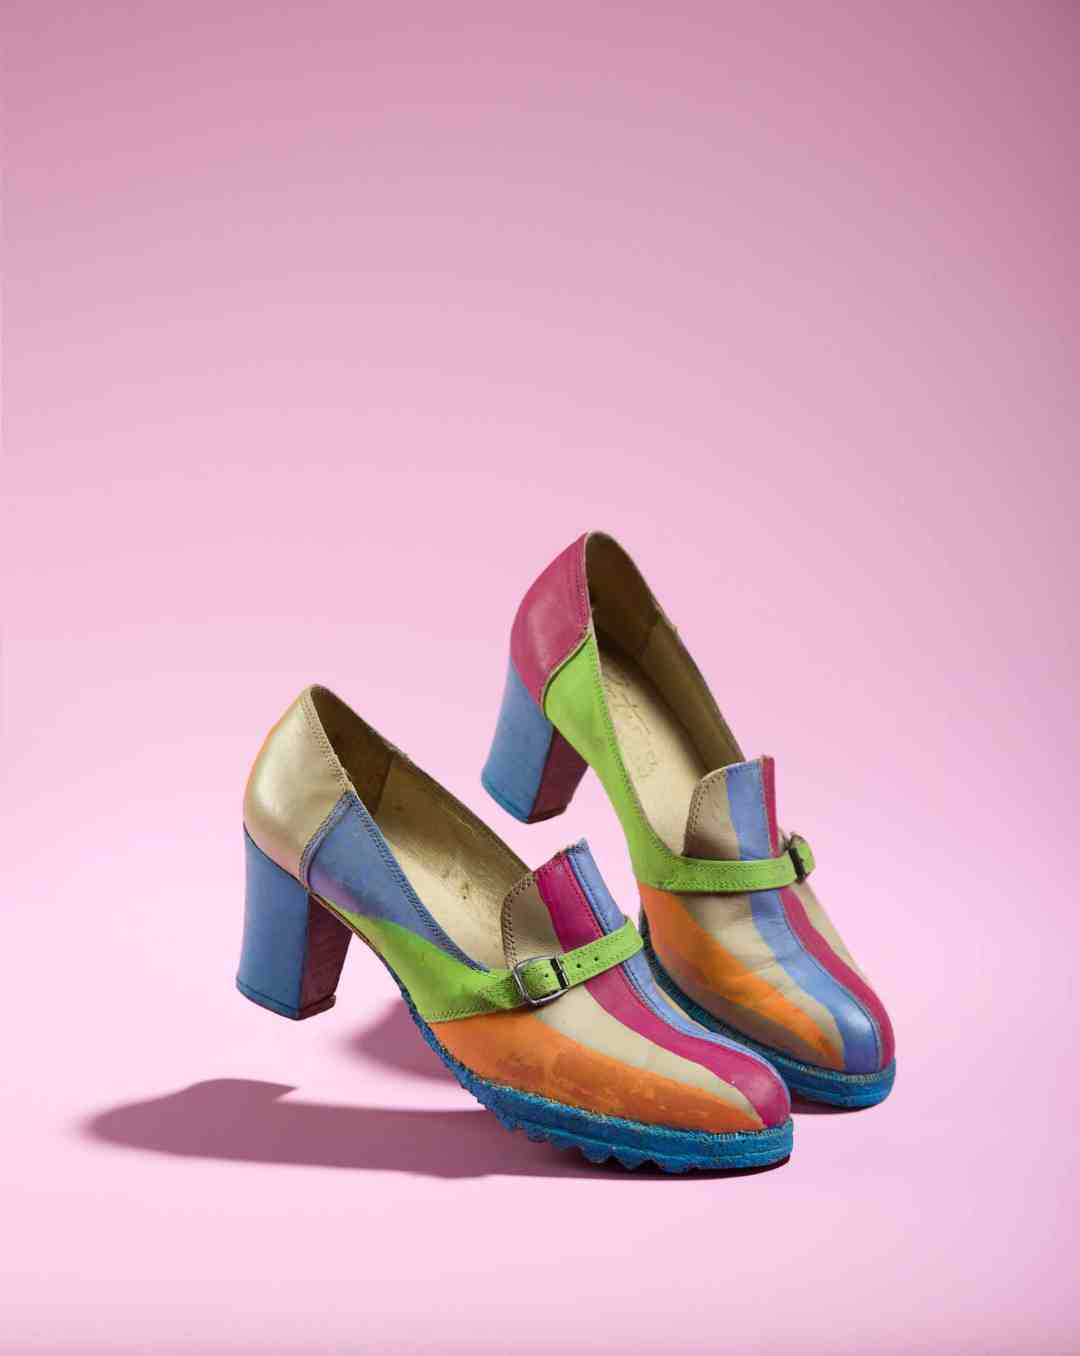 Henryk Stazewski (1894 - 1988) Anda's Rottenberg Shoes, circa 1981